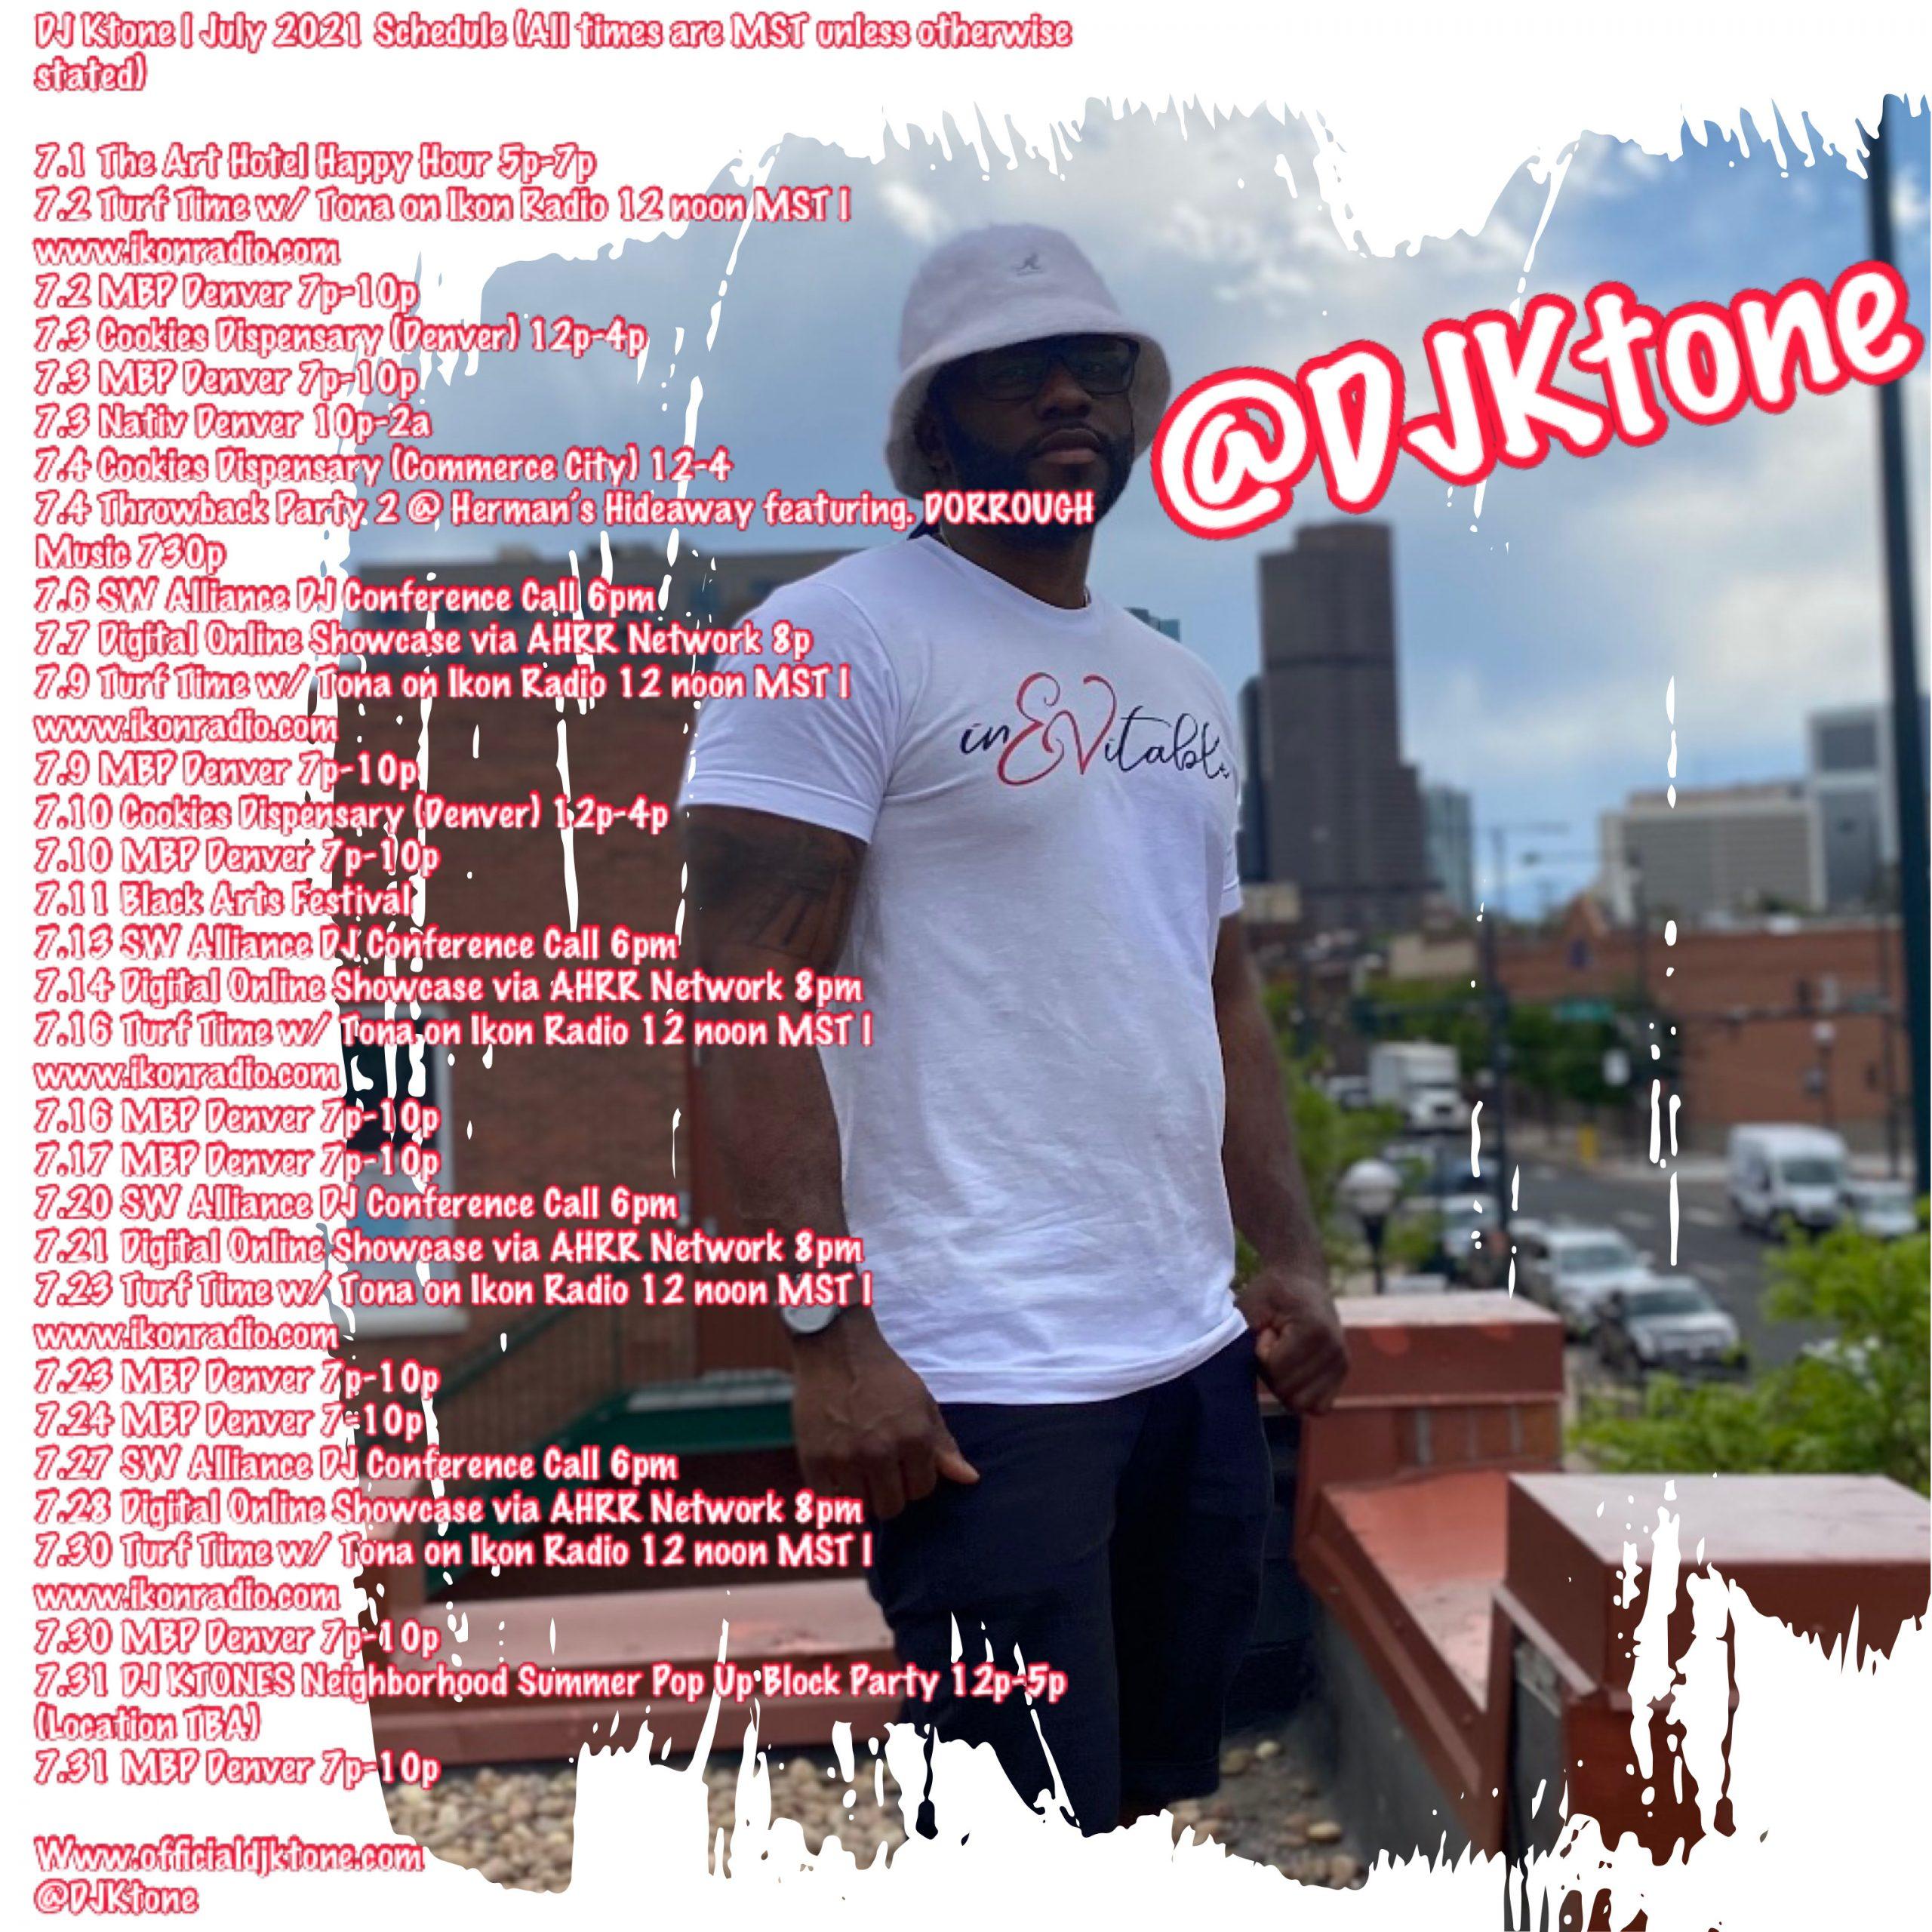 DJ Ktone July 2021 Schedule